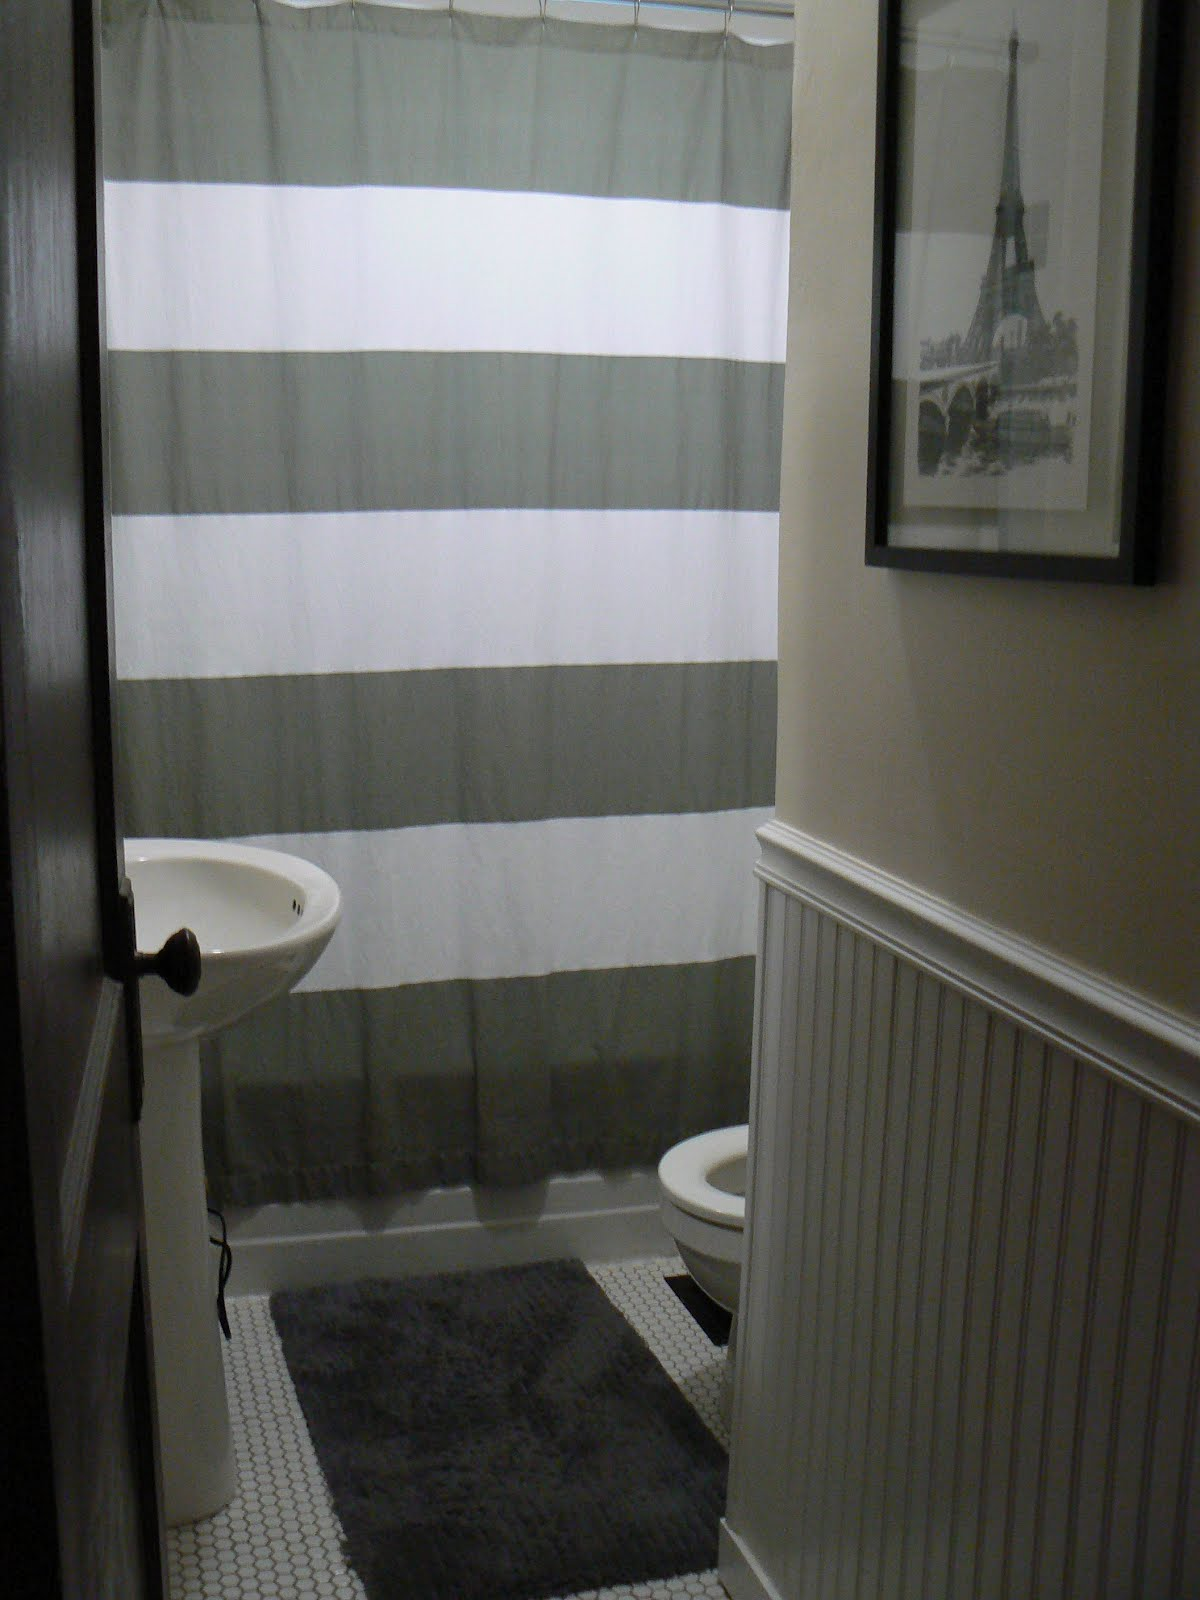 Horizontal Black And White Striped Shower Curtain - Brown and white striped shower curtain